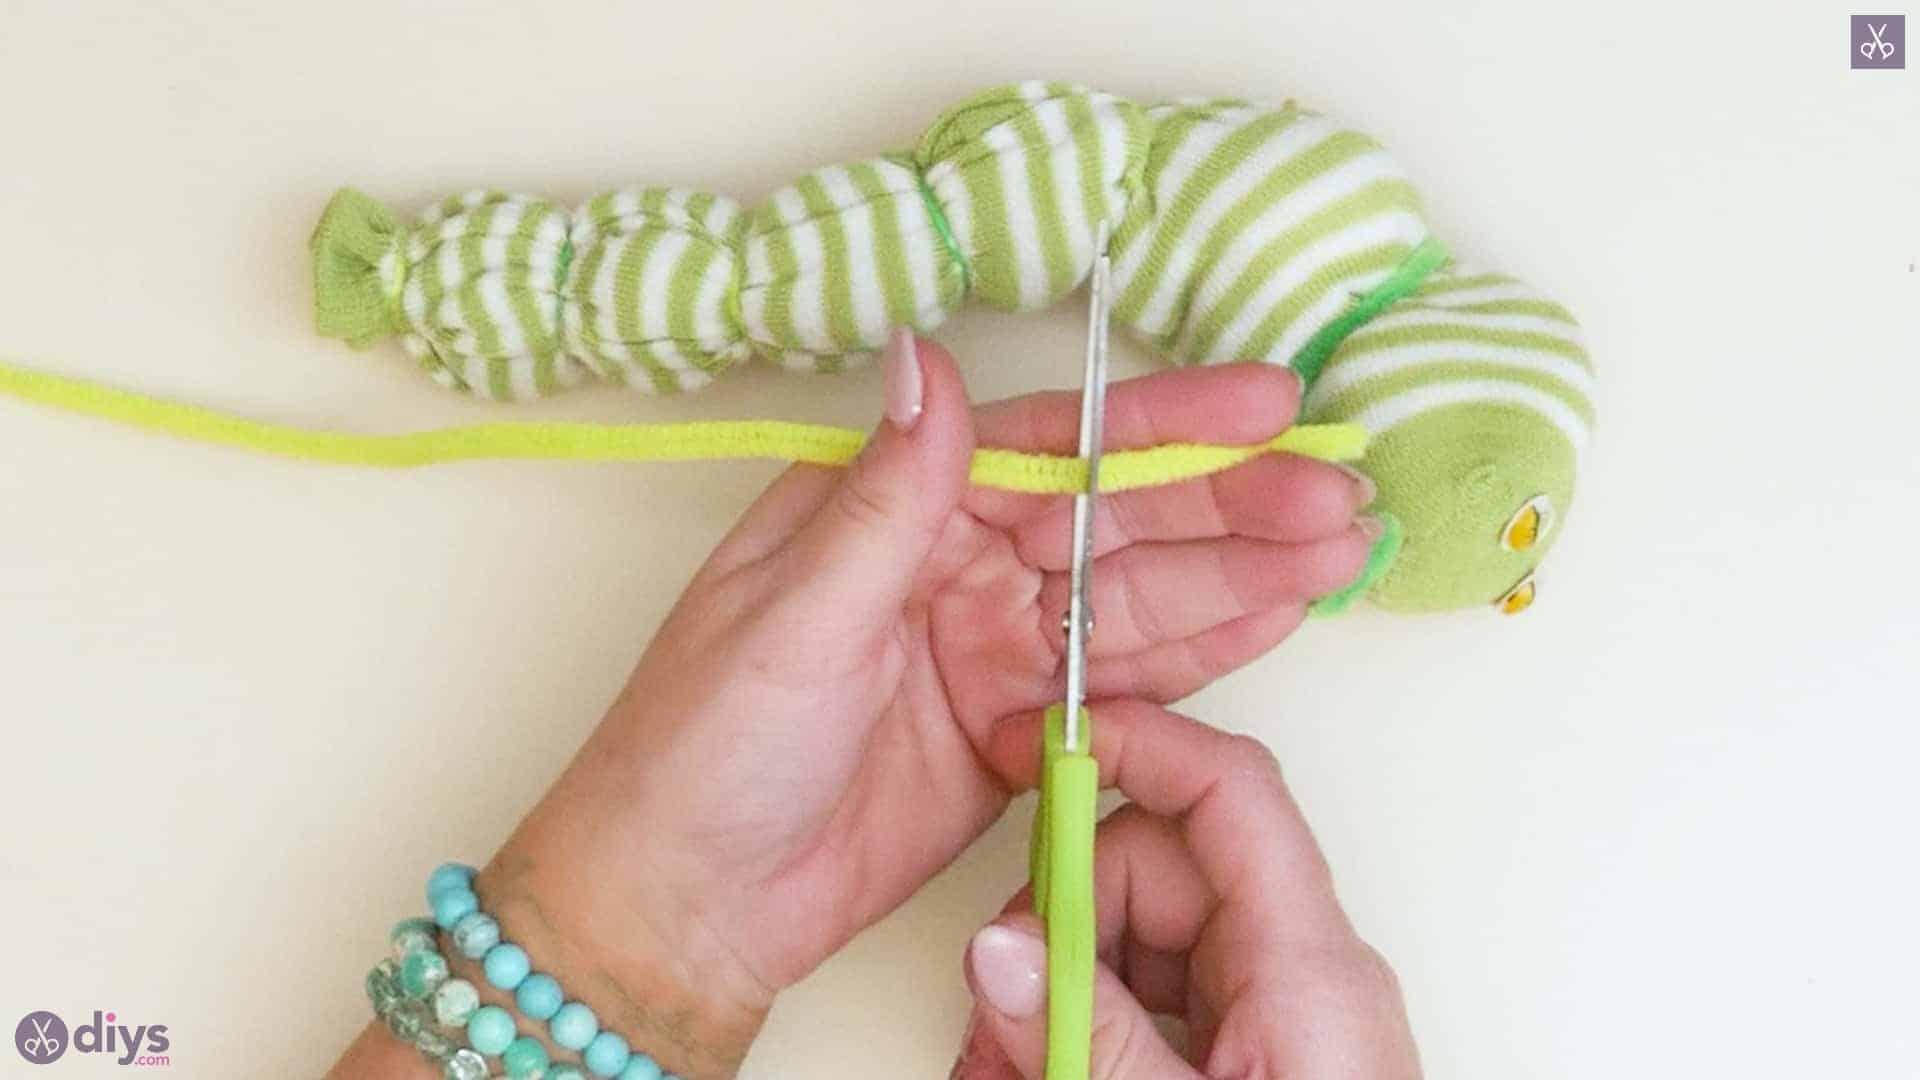 Diy no sew sock worm step 8